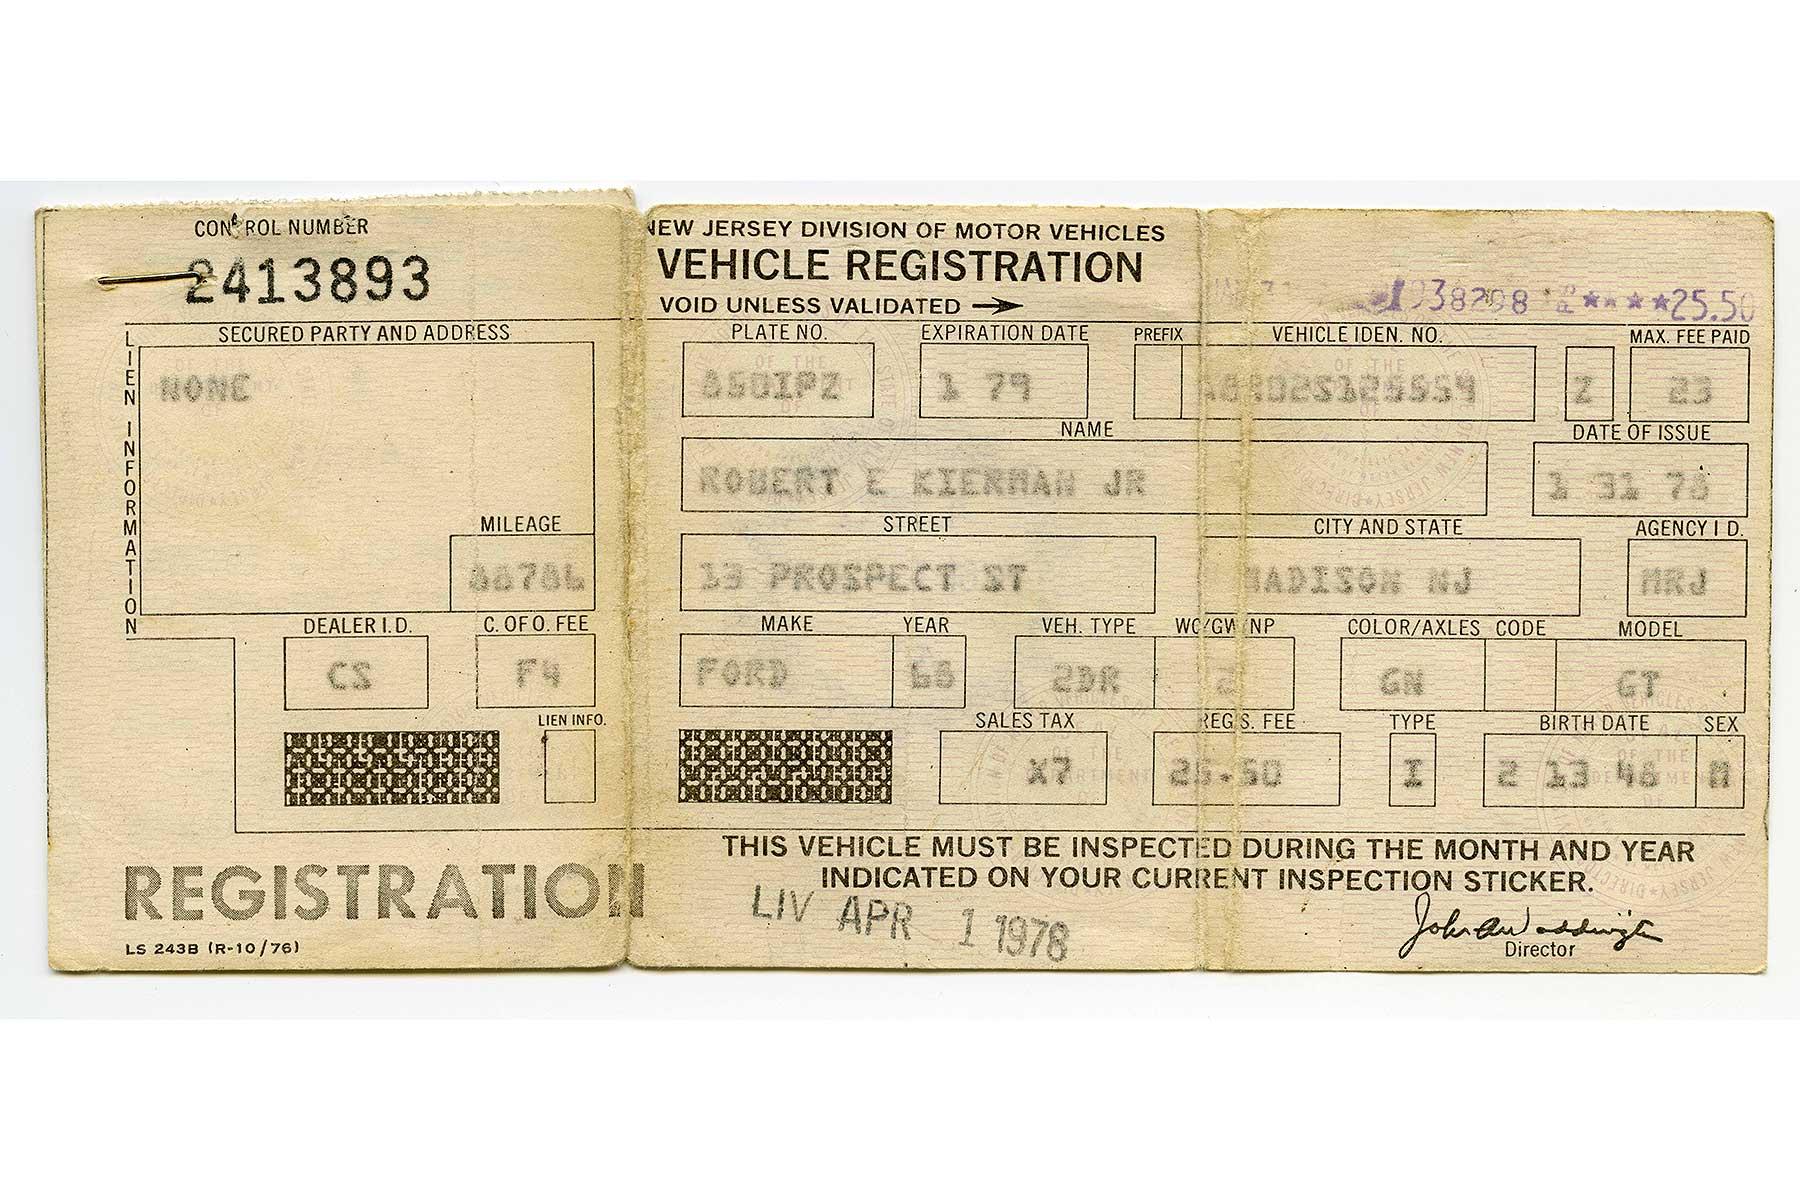 Robert Kiernan S New Jersey Vehicle Registration